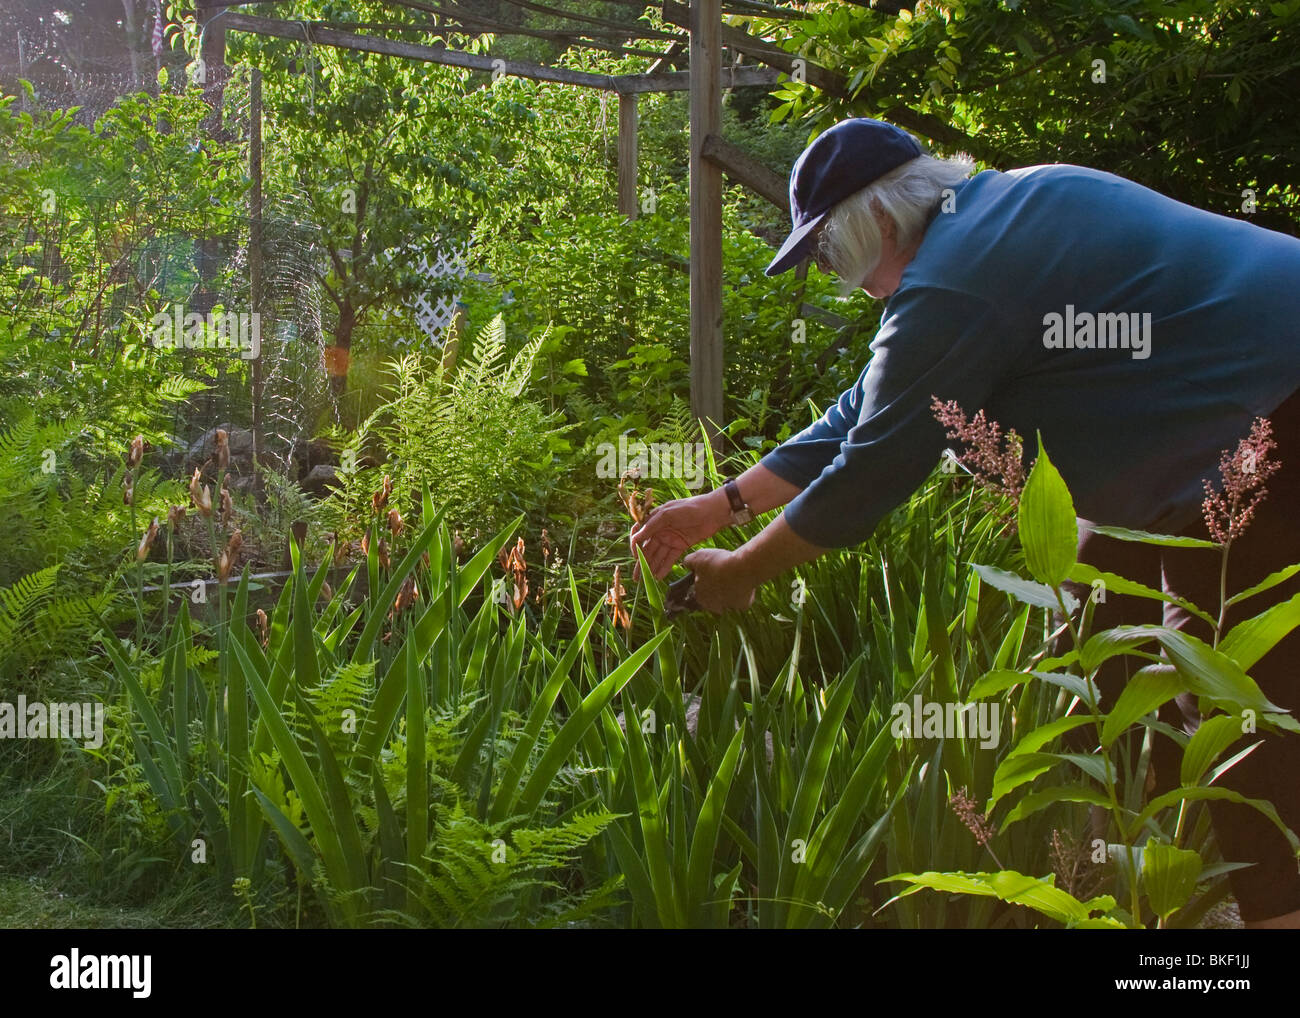 Caucasian female gardener trims plants in garden - Stock Image